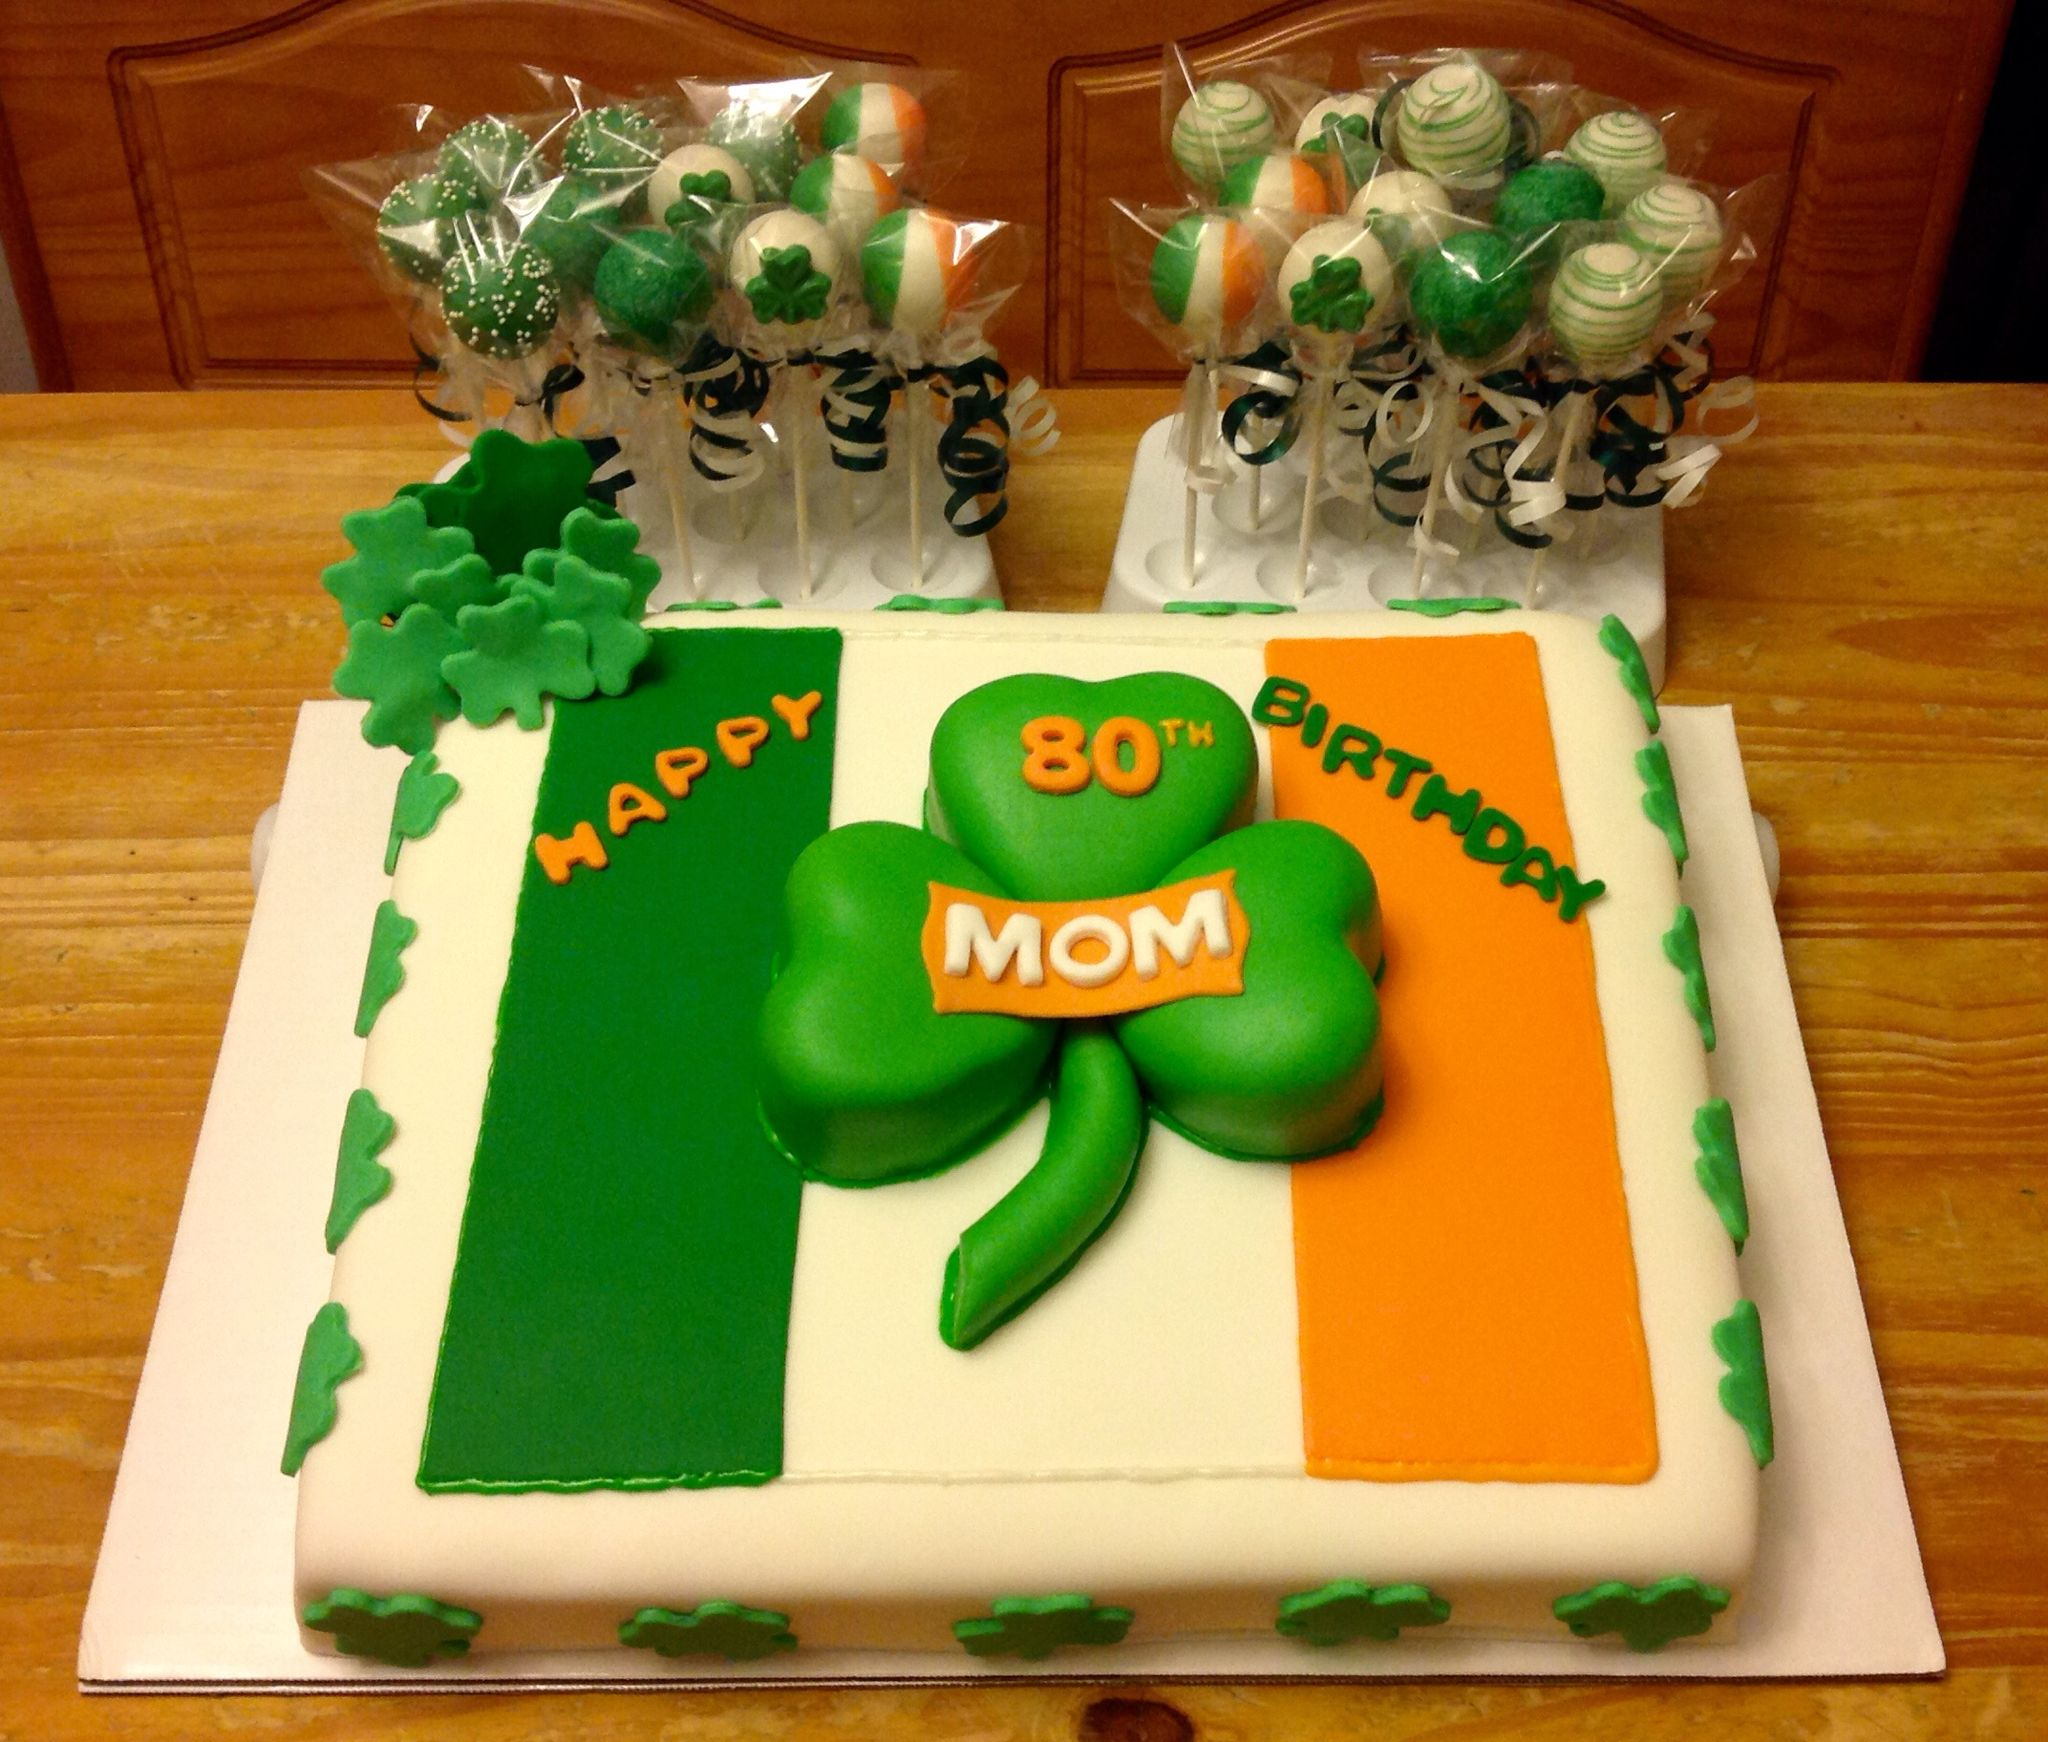 Irish flag shamrock theme birthday cake and cake pops